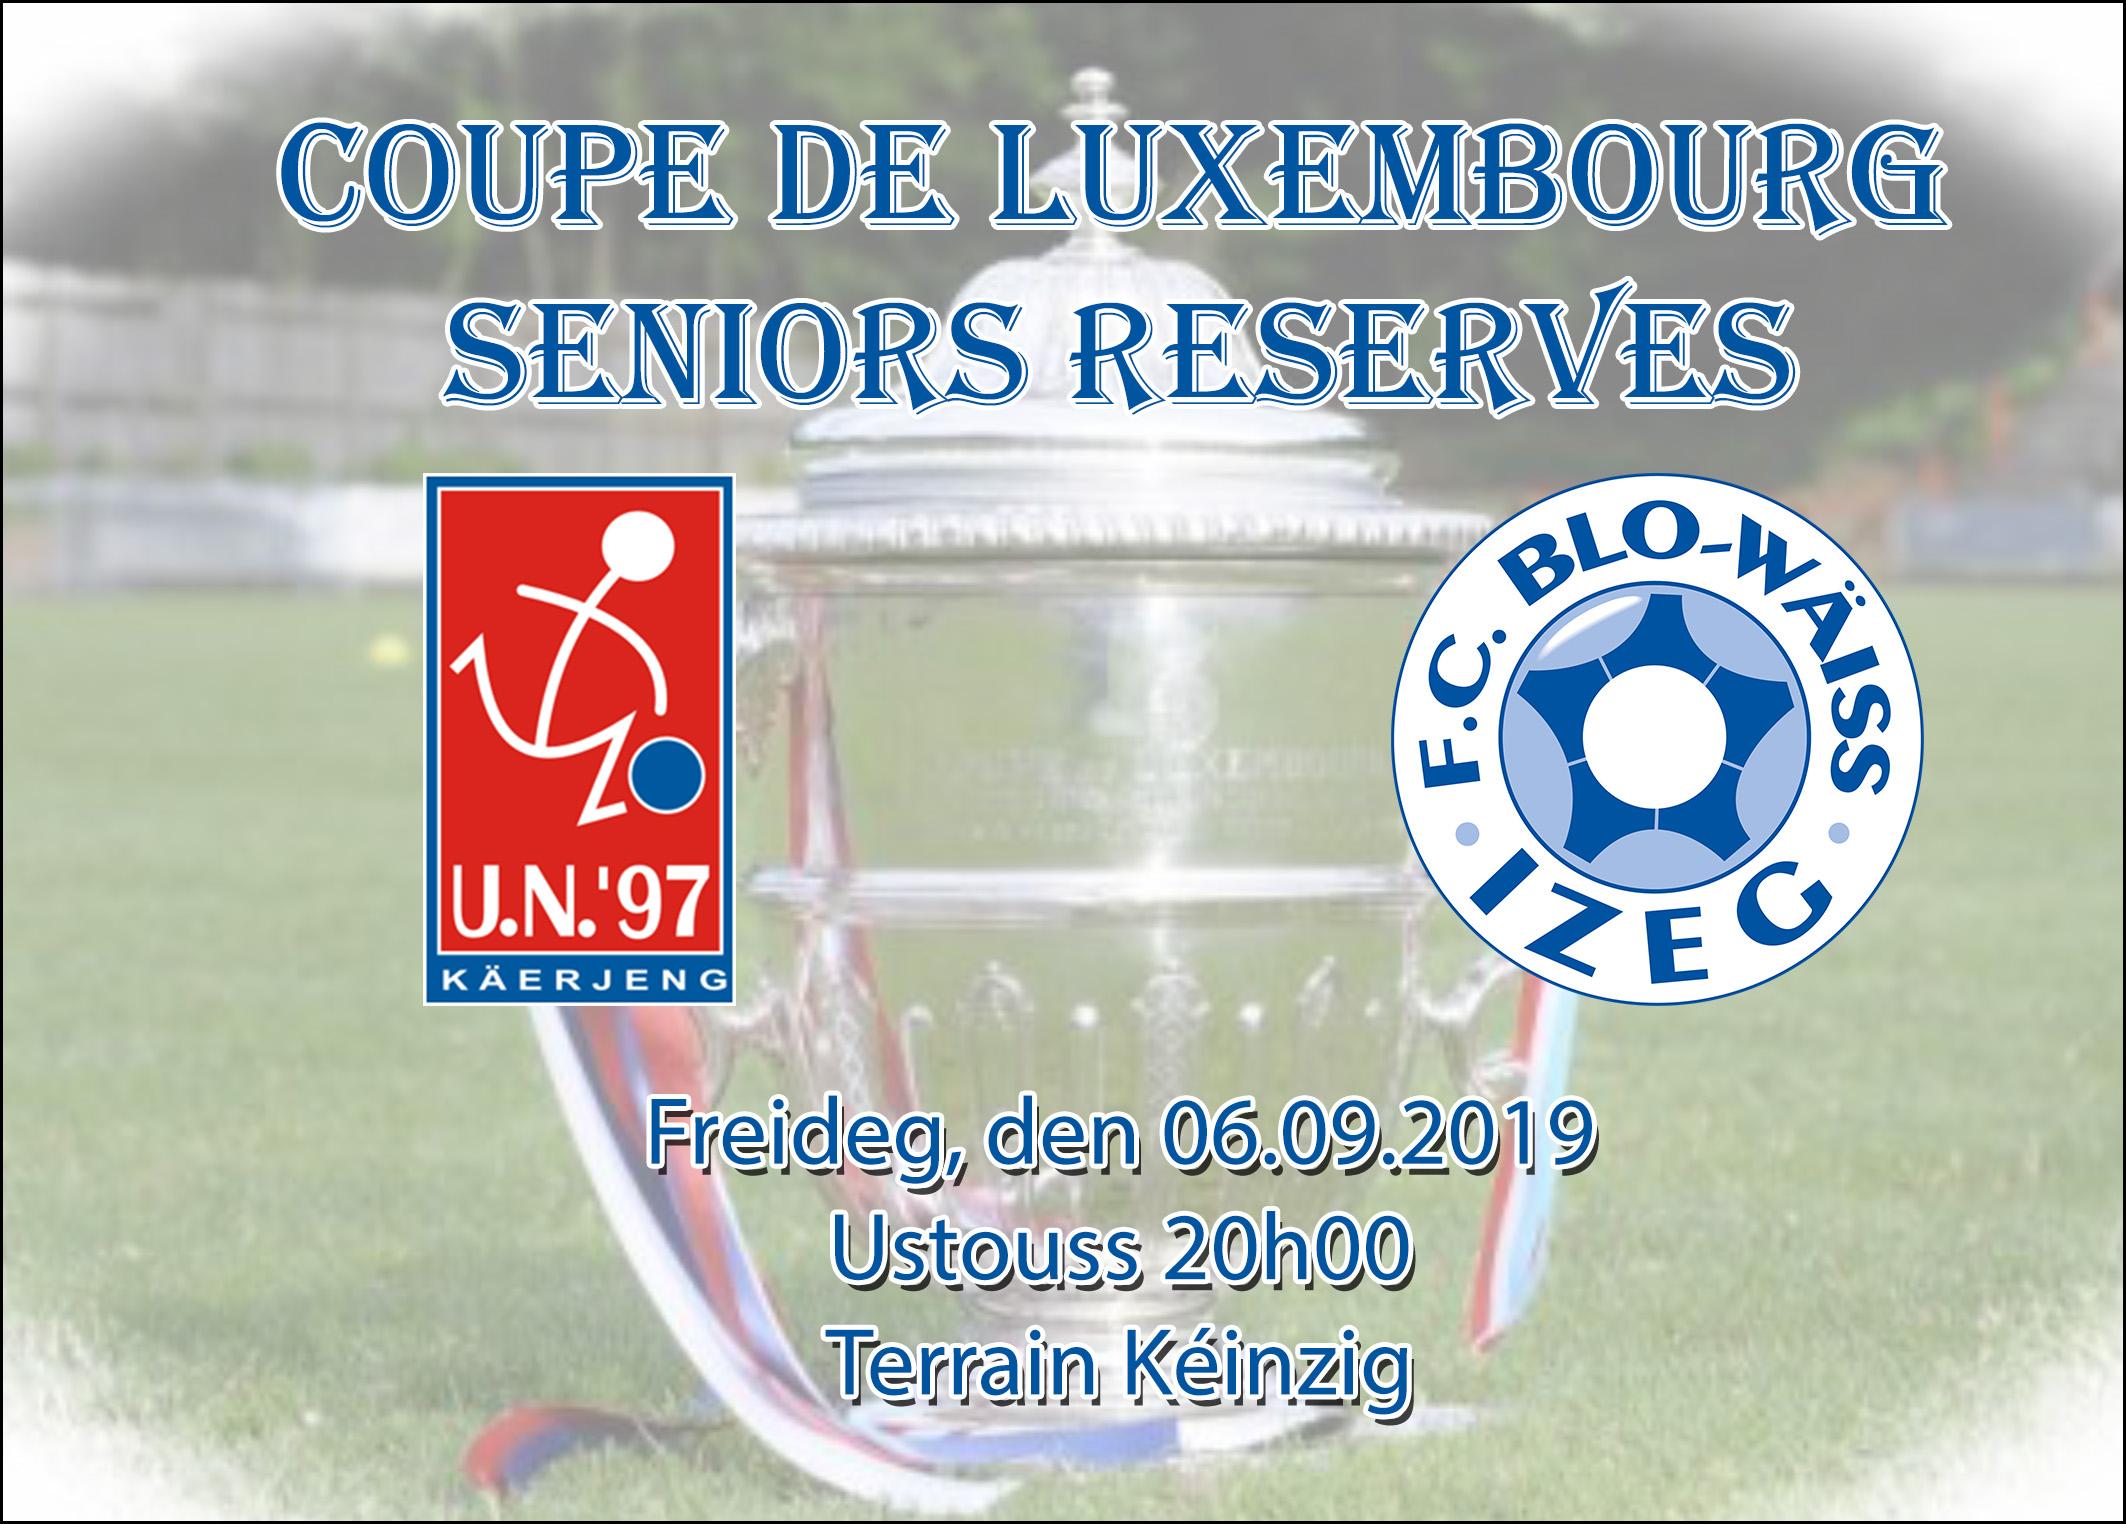 Coupe de Luxembourg - Seniors Reserven